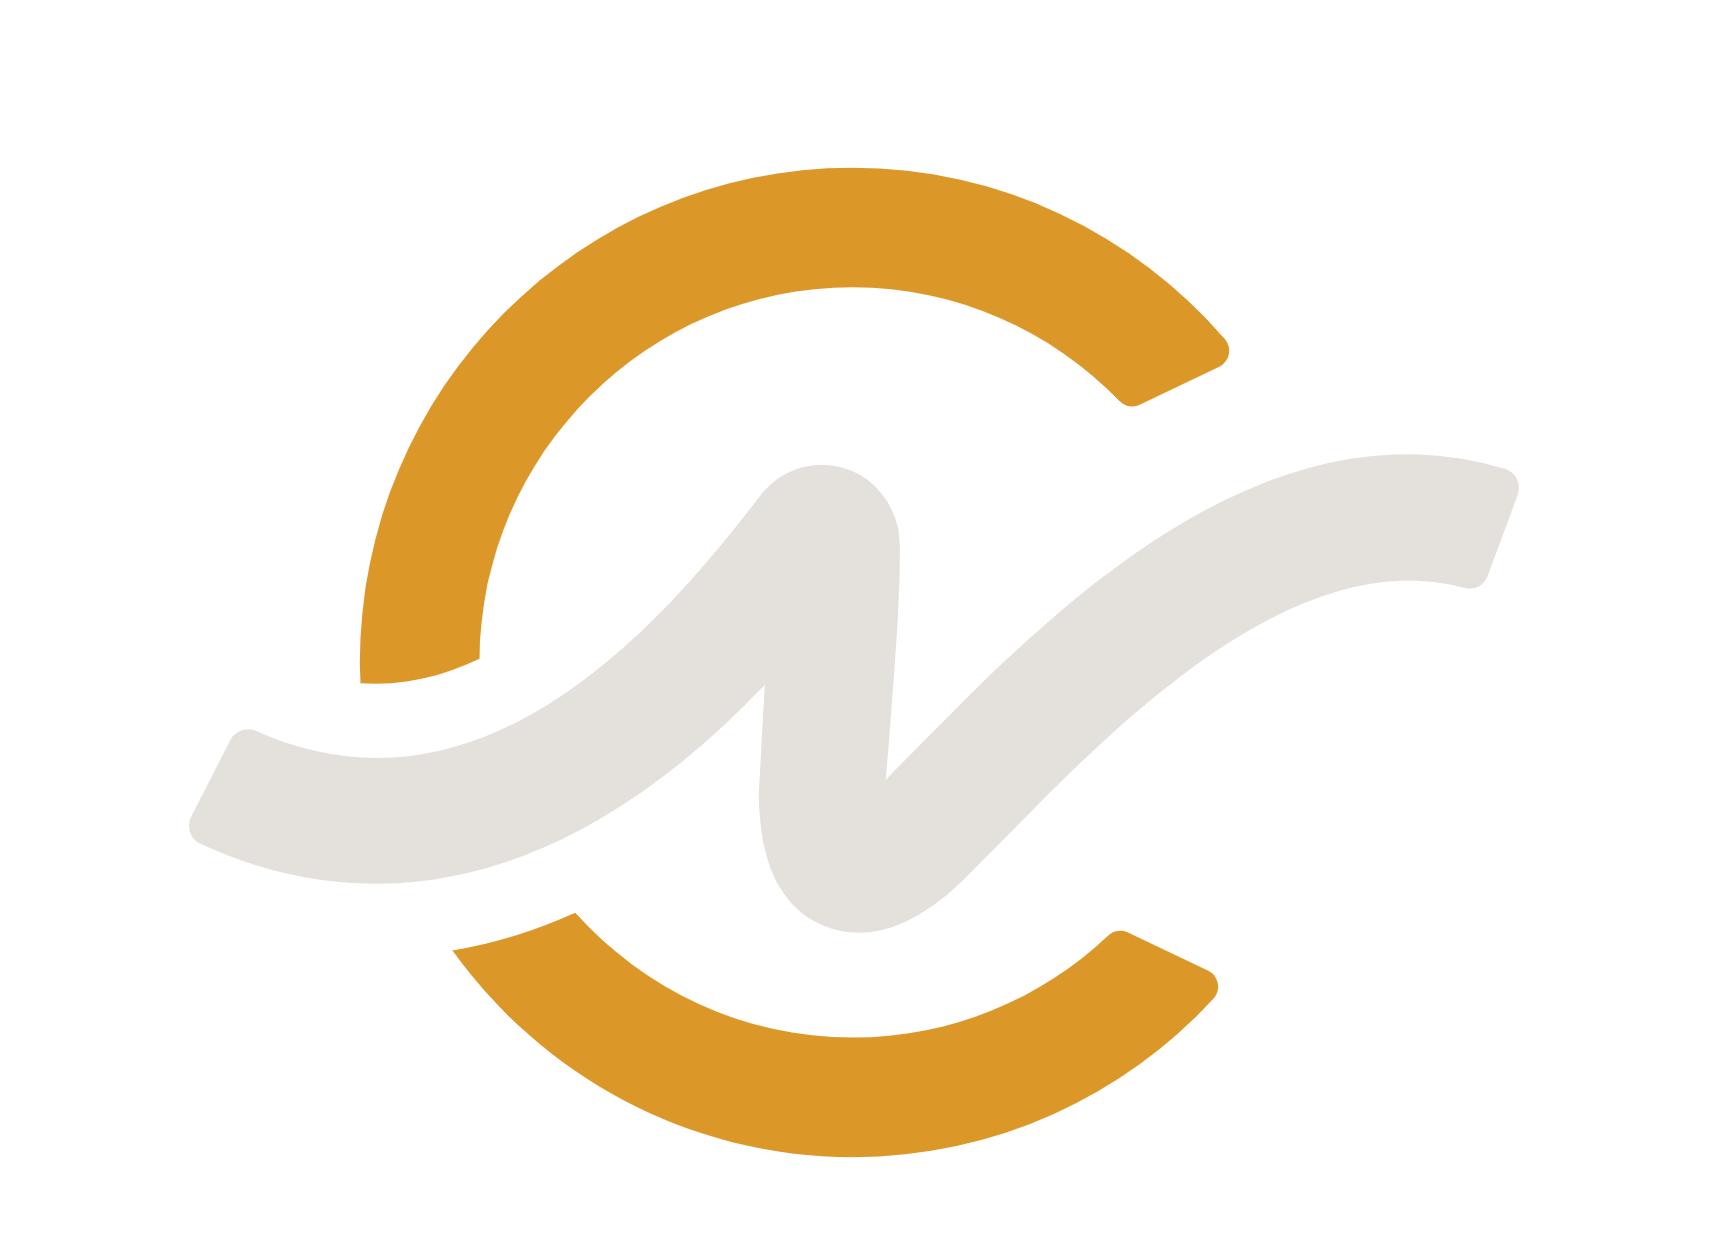 Logo for State of North Carolina